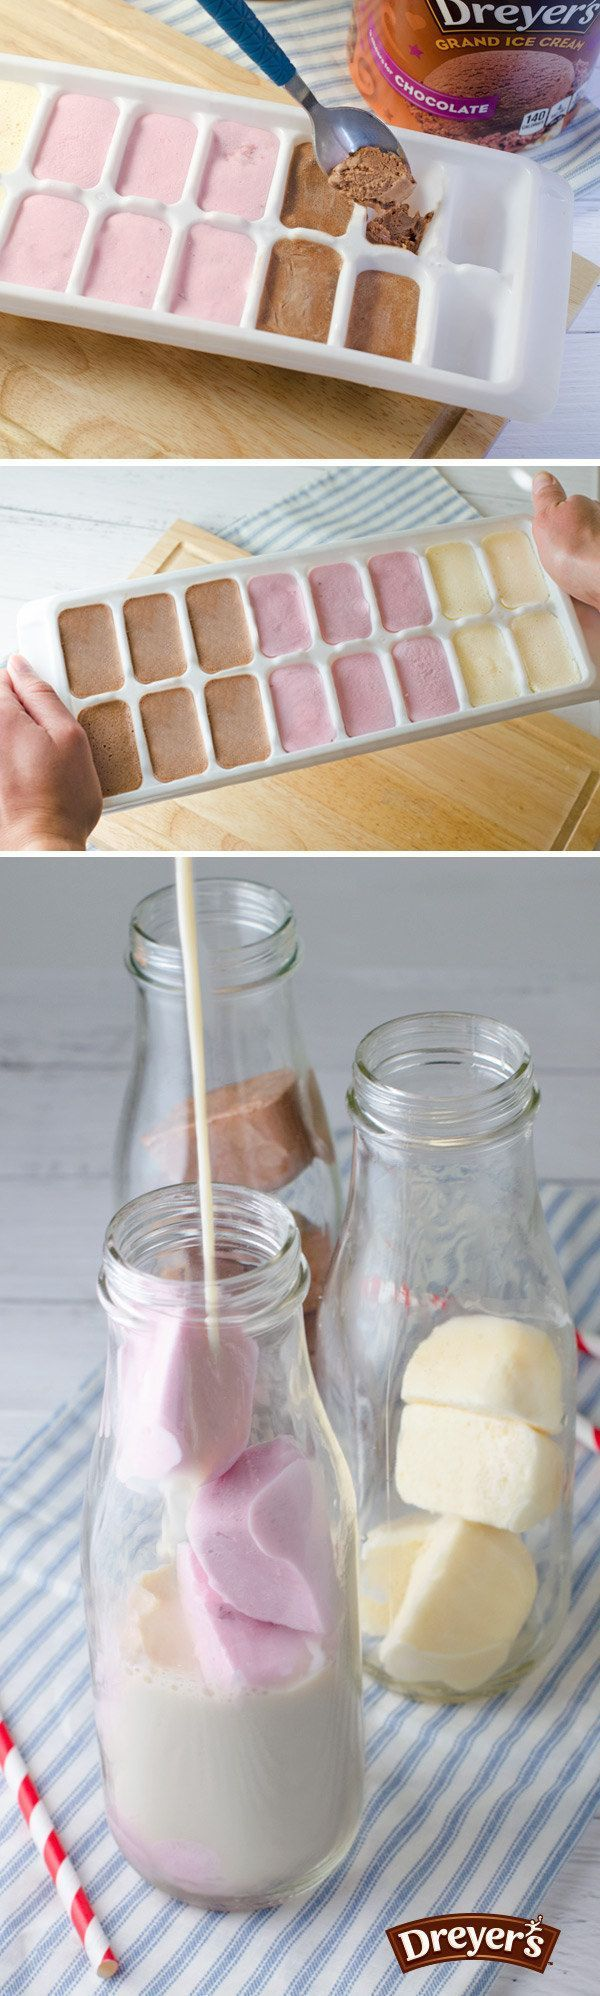 14 Ways To Take Your Ice Cubes To The Next Level - (Shown - make some milkshakes to take on-the-go).